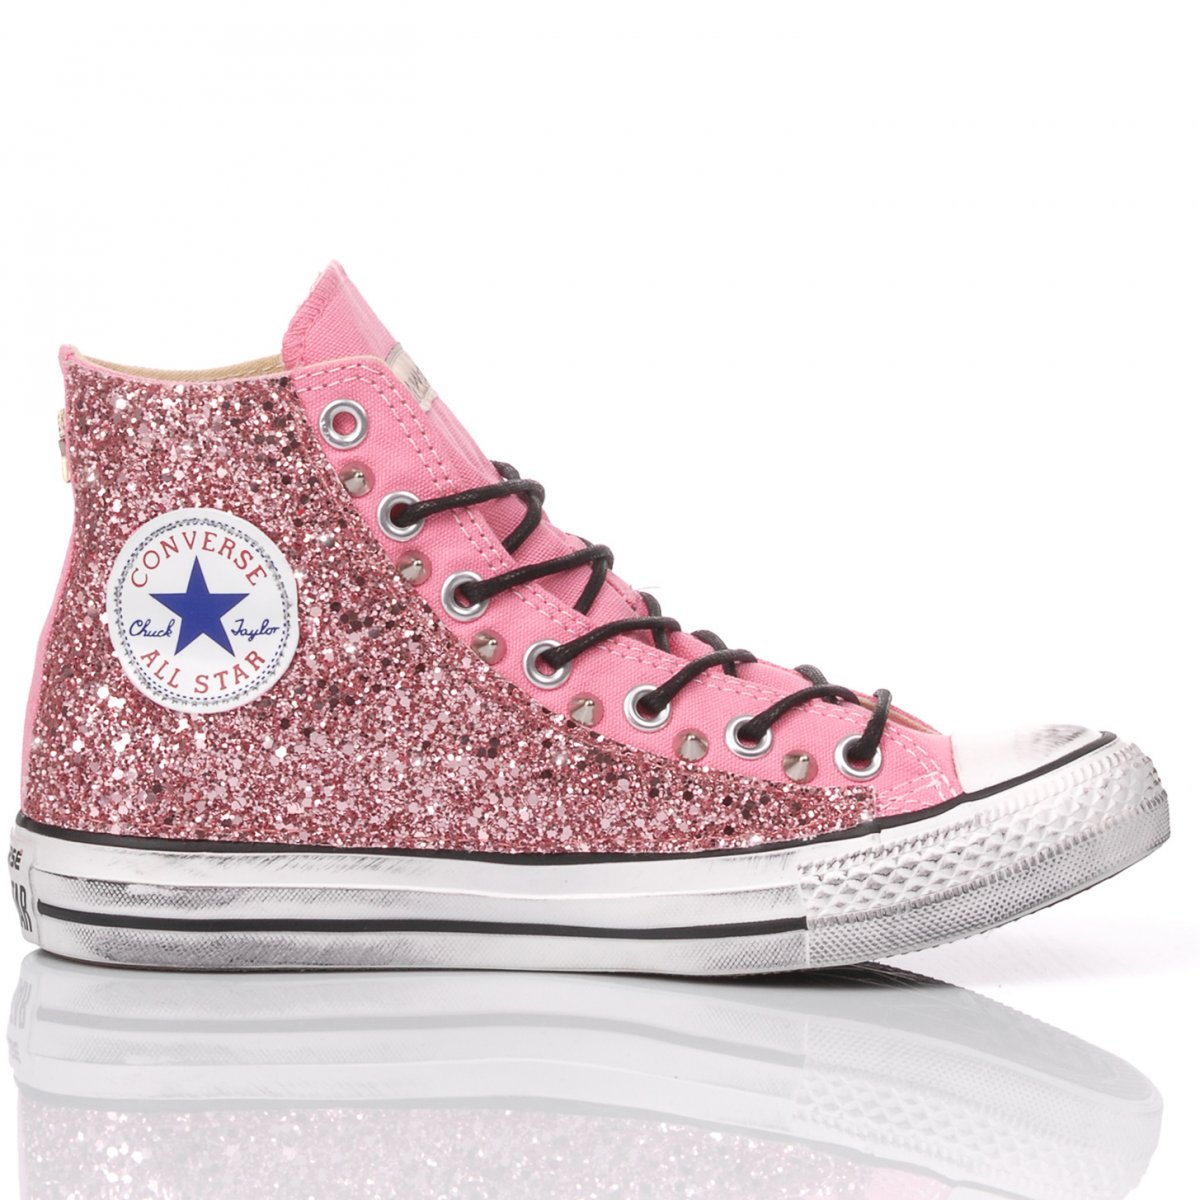 Converse Glitter Pink